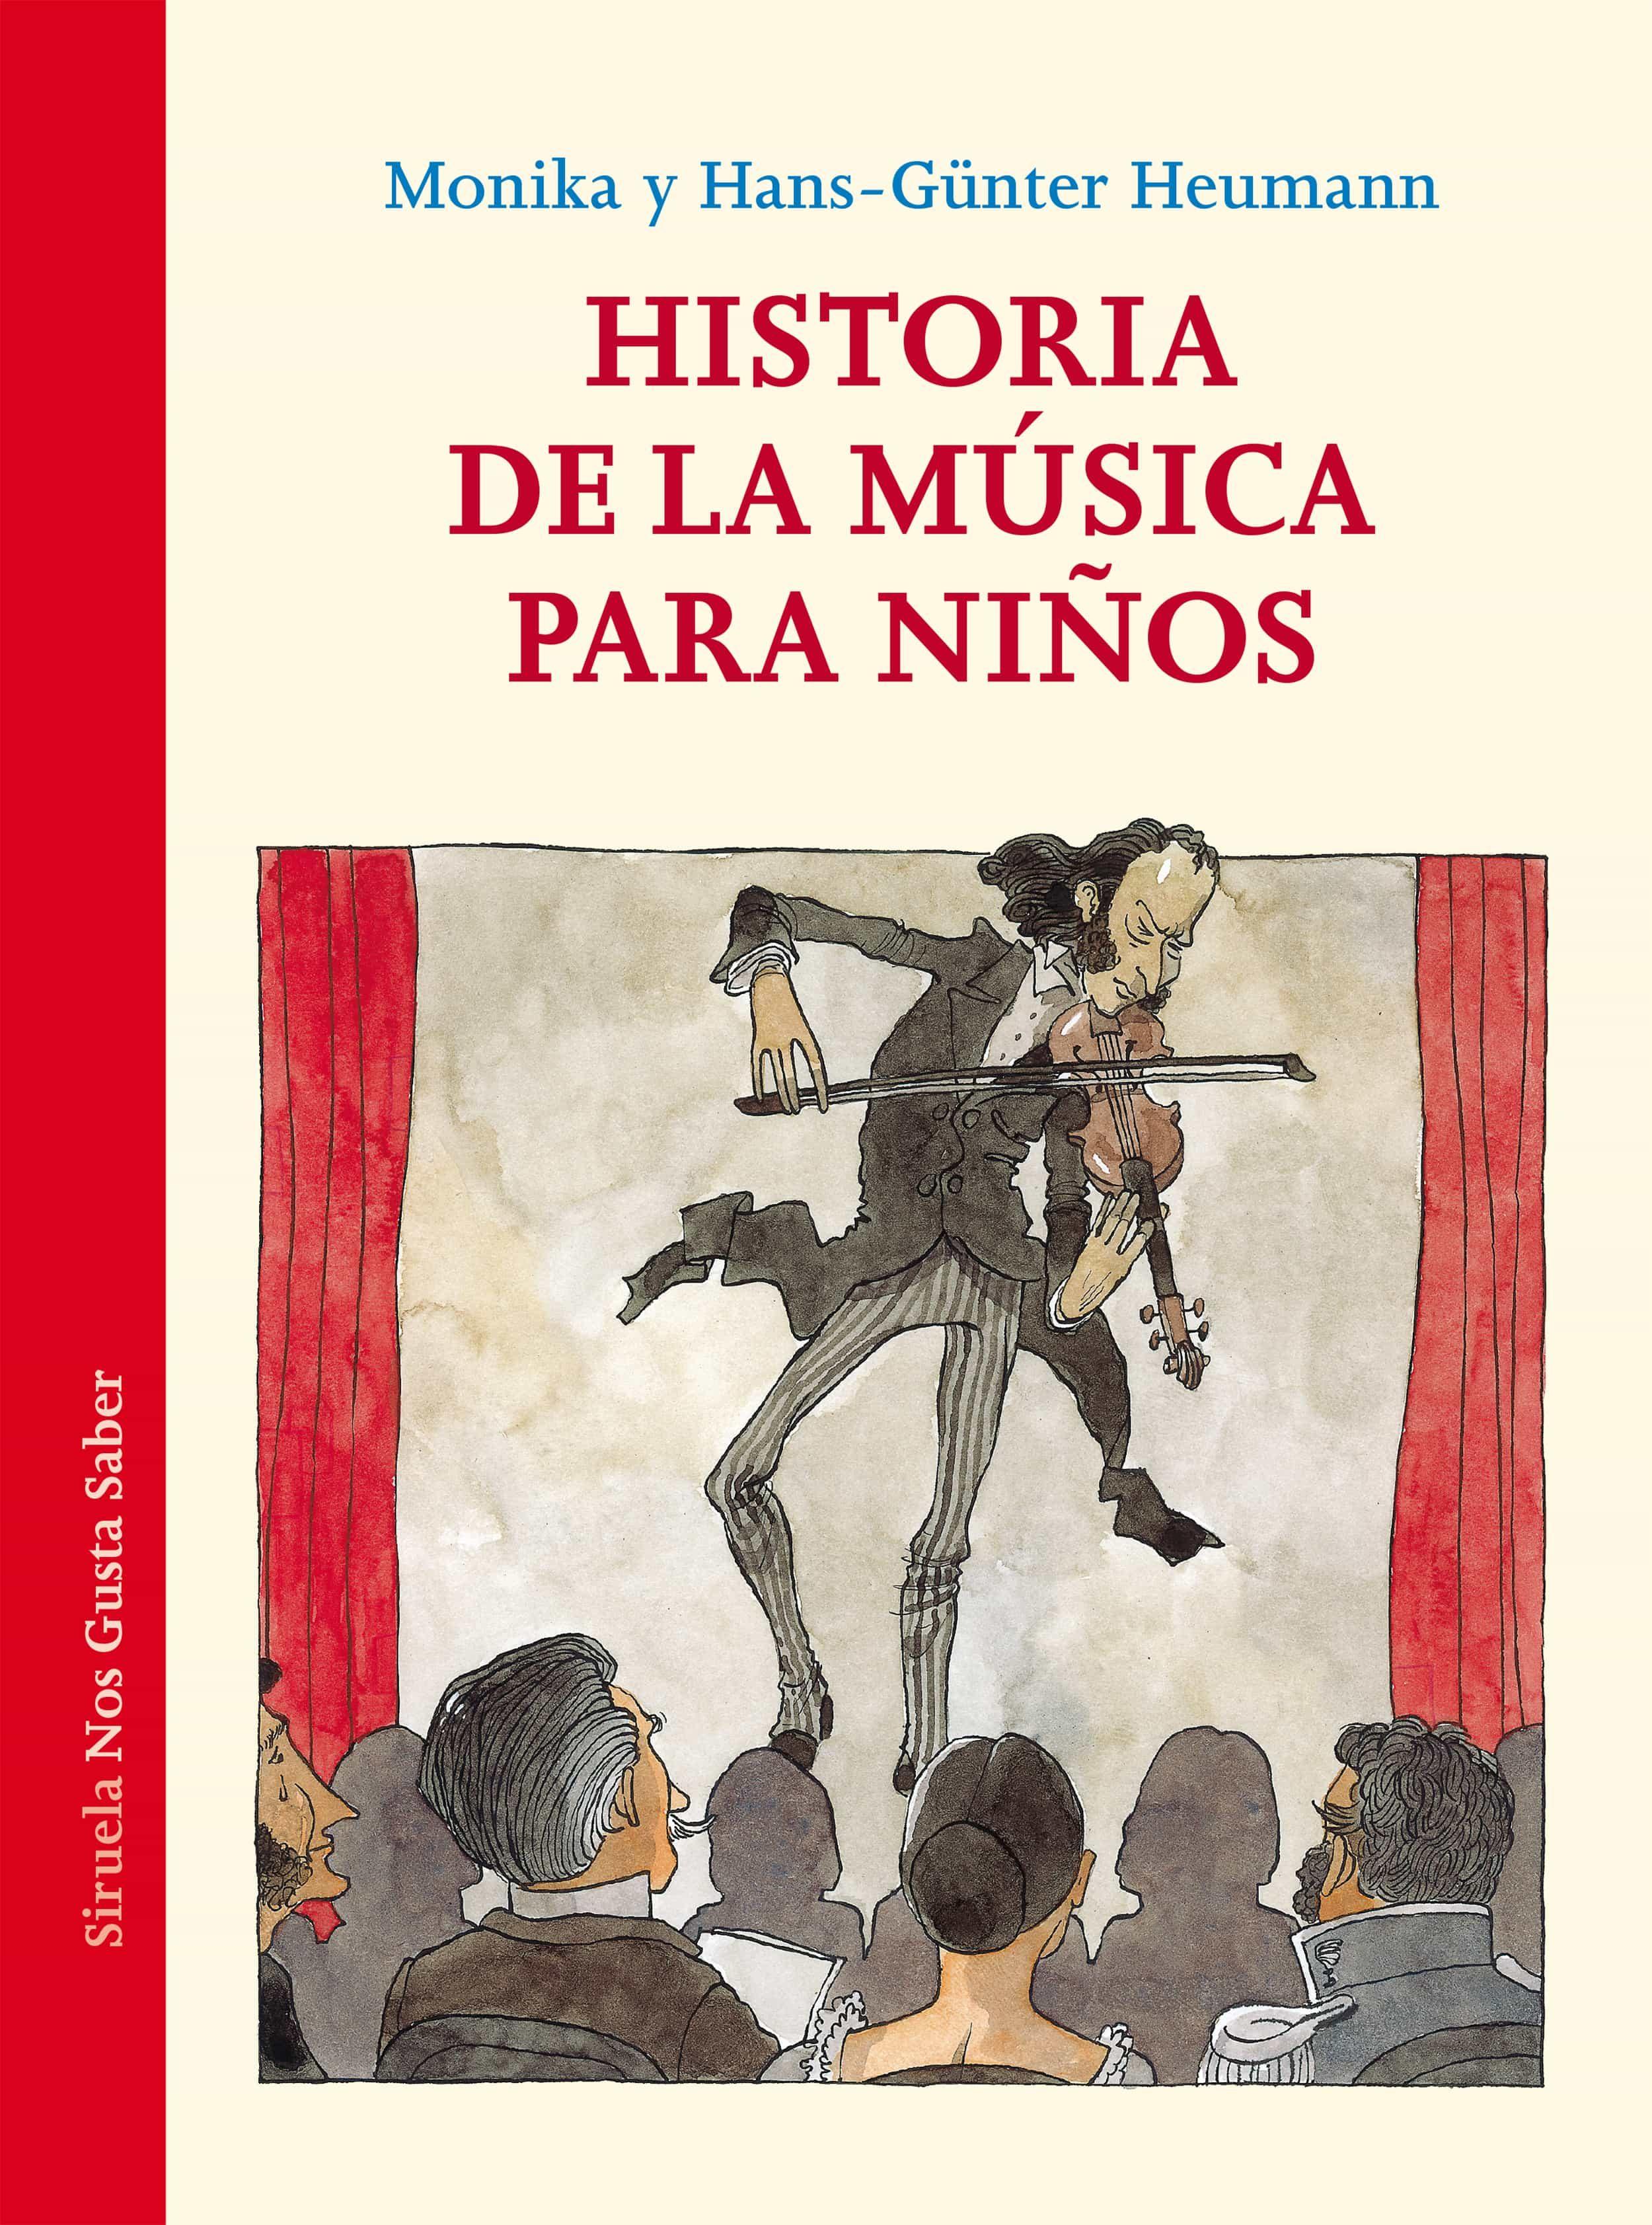 Historia De La Musica Para Niños por Monika Heumann